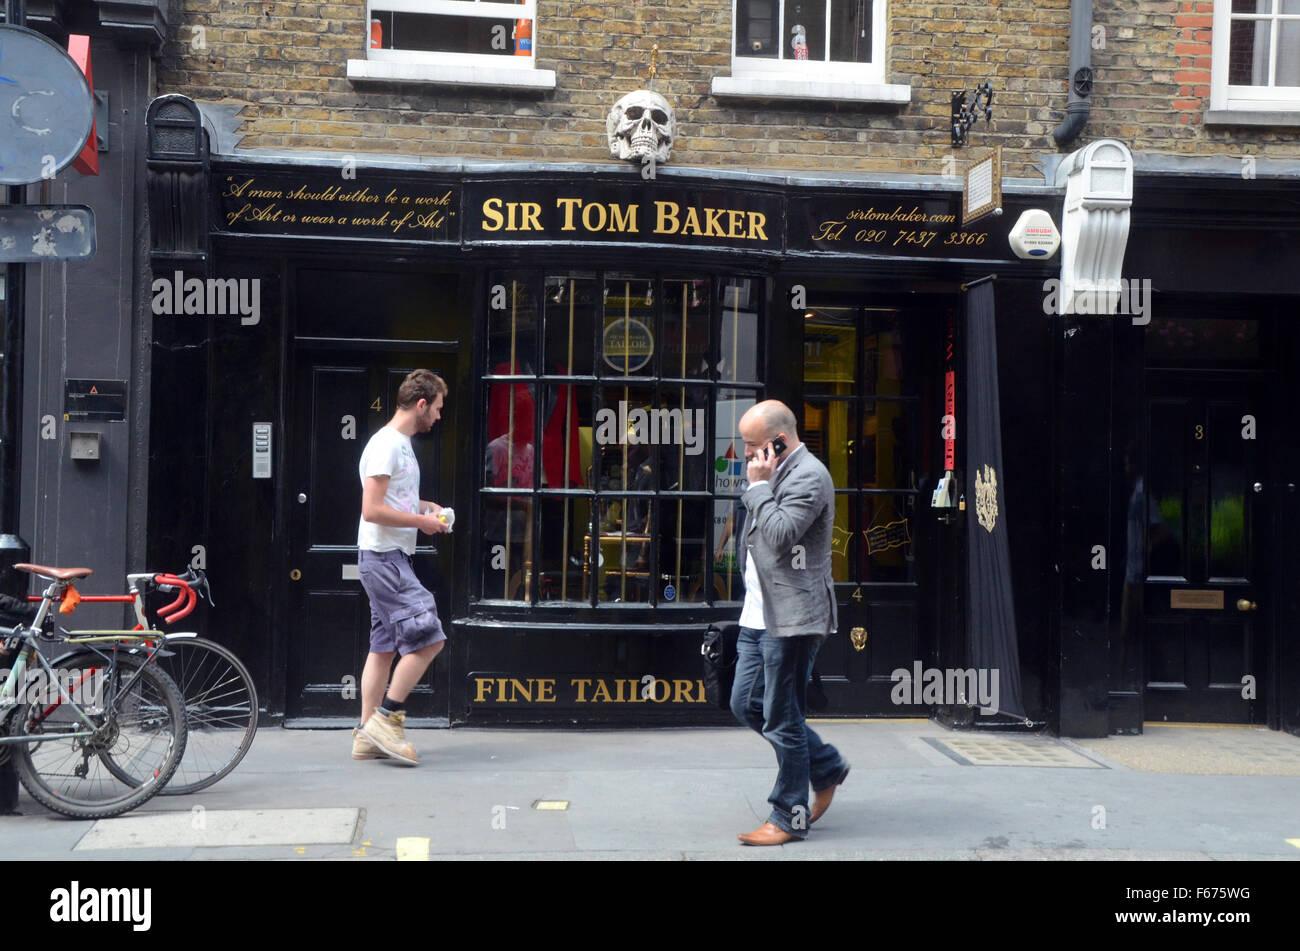 c412a1f799829 Sir Tom Baker Stock Photos   Sir Tom Baker Stock Images - Alamy